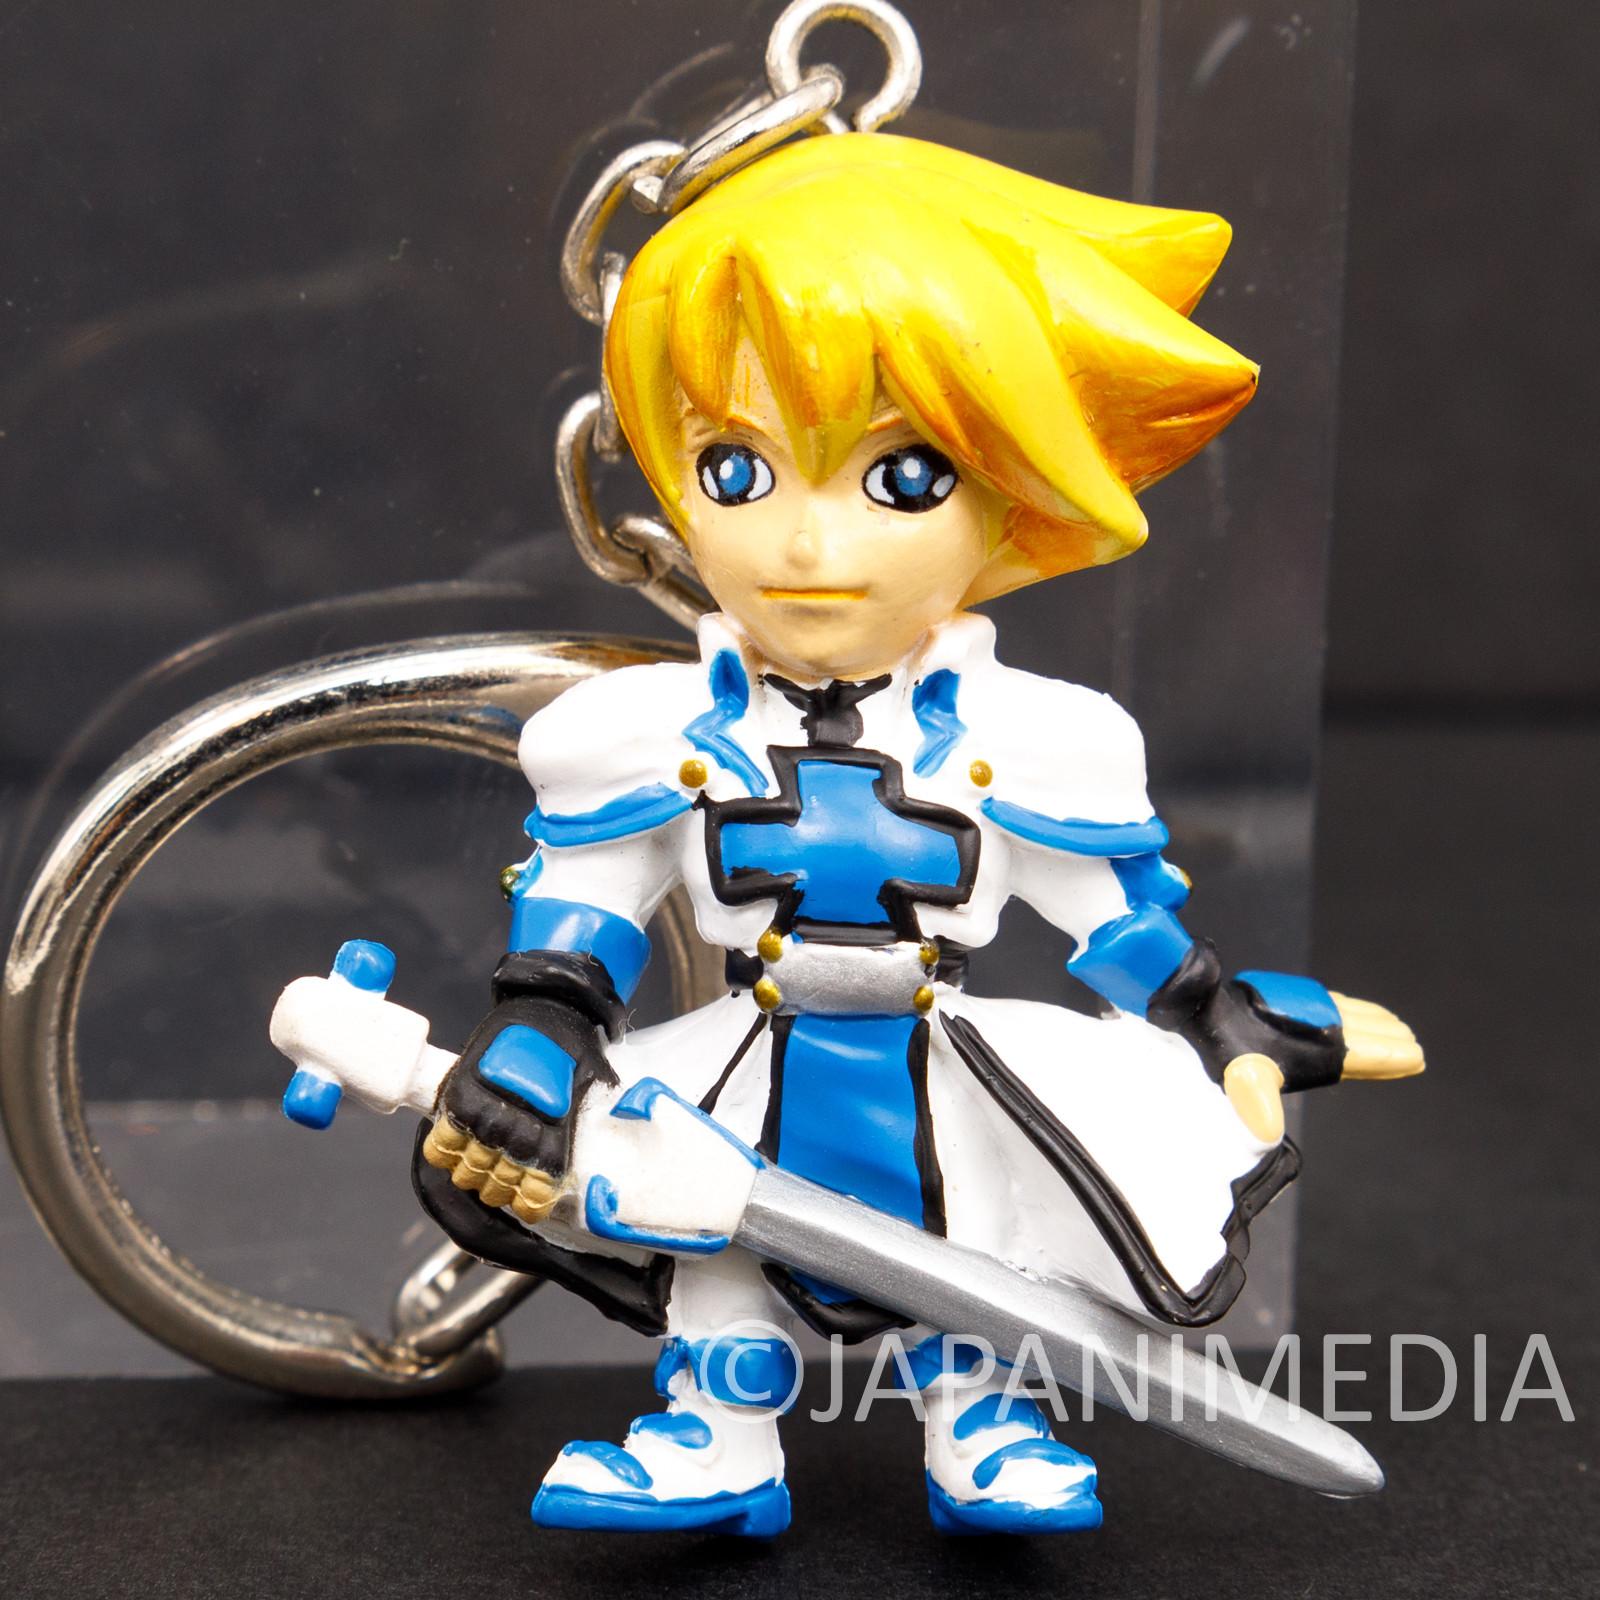 RARE! Guilty Gear Ky Kiske Figure Keychain Playstation2 Limited JAPAN GAME